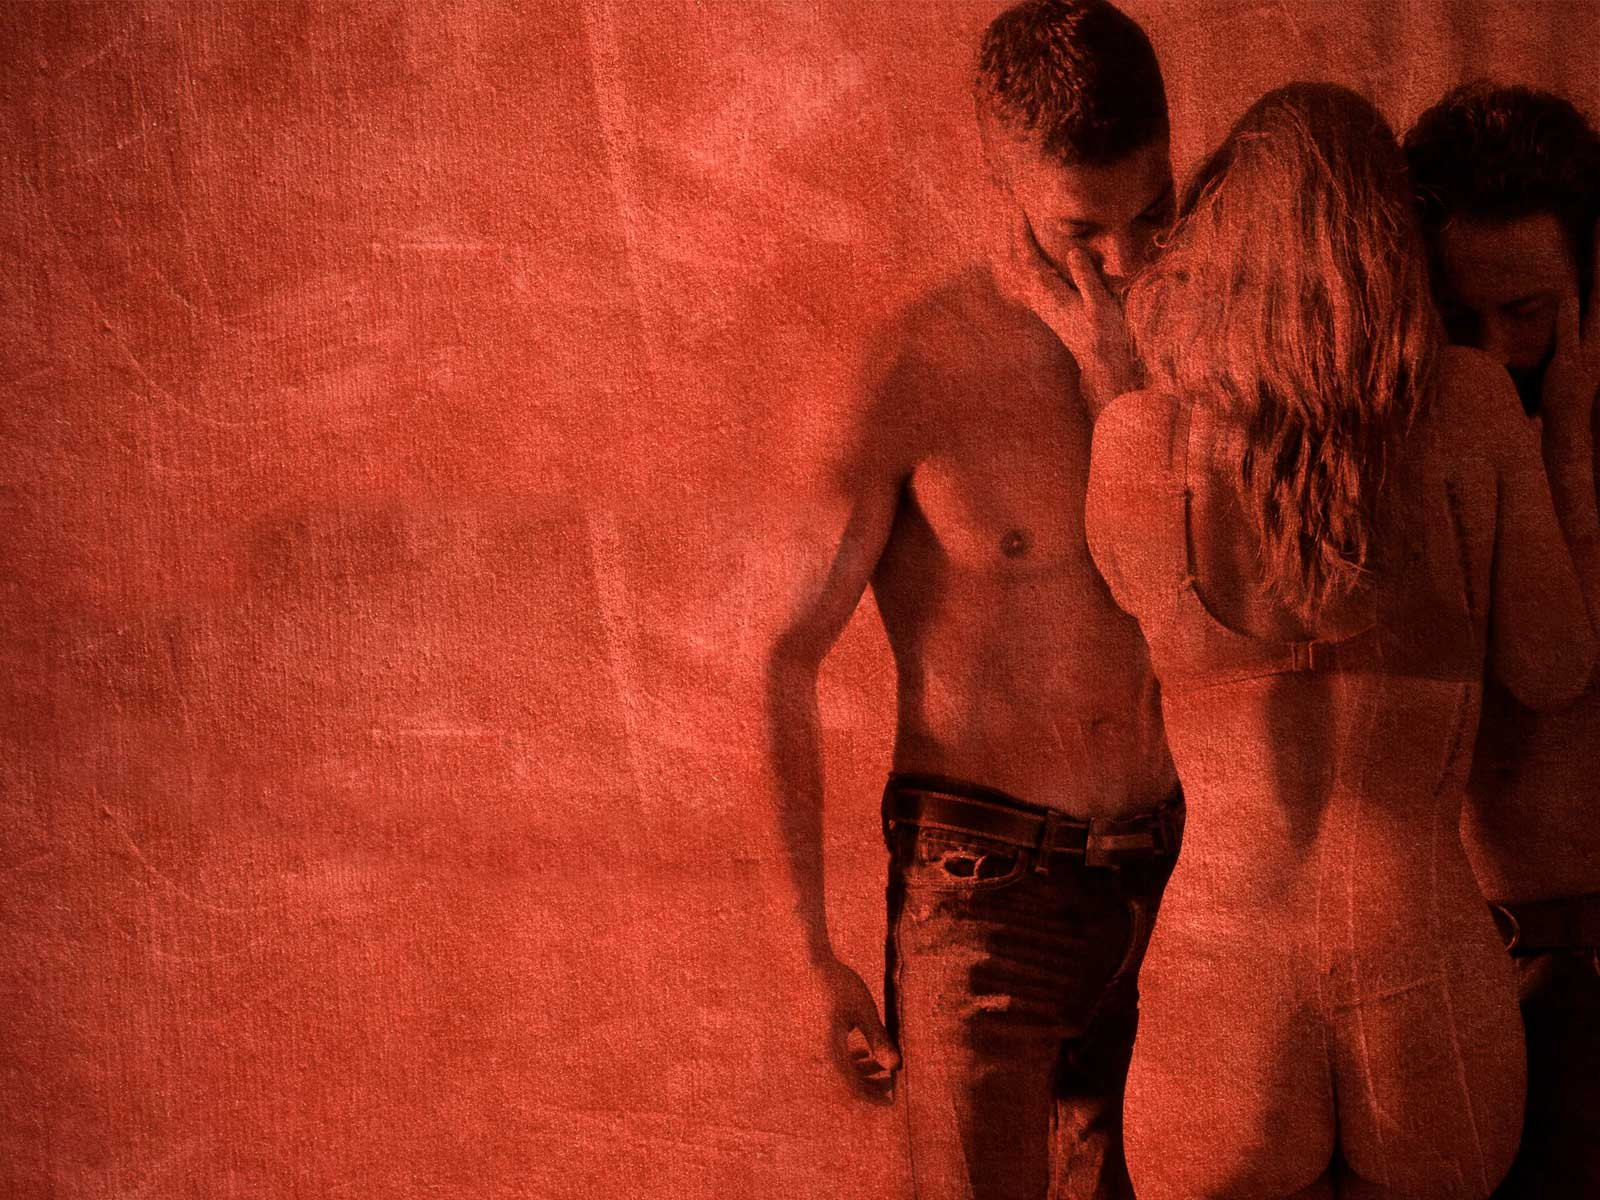 Erotic suspense novels